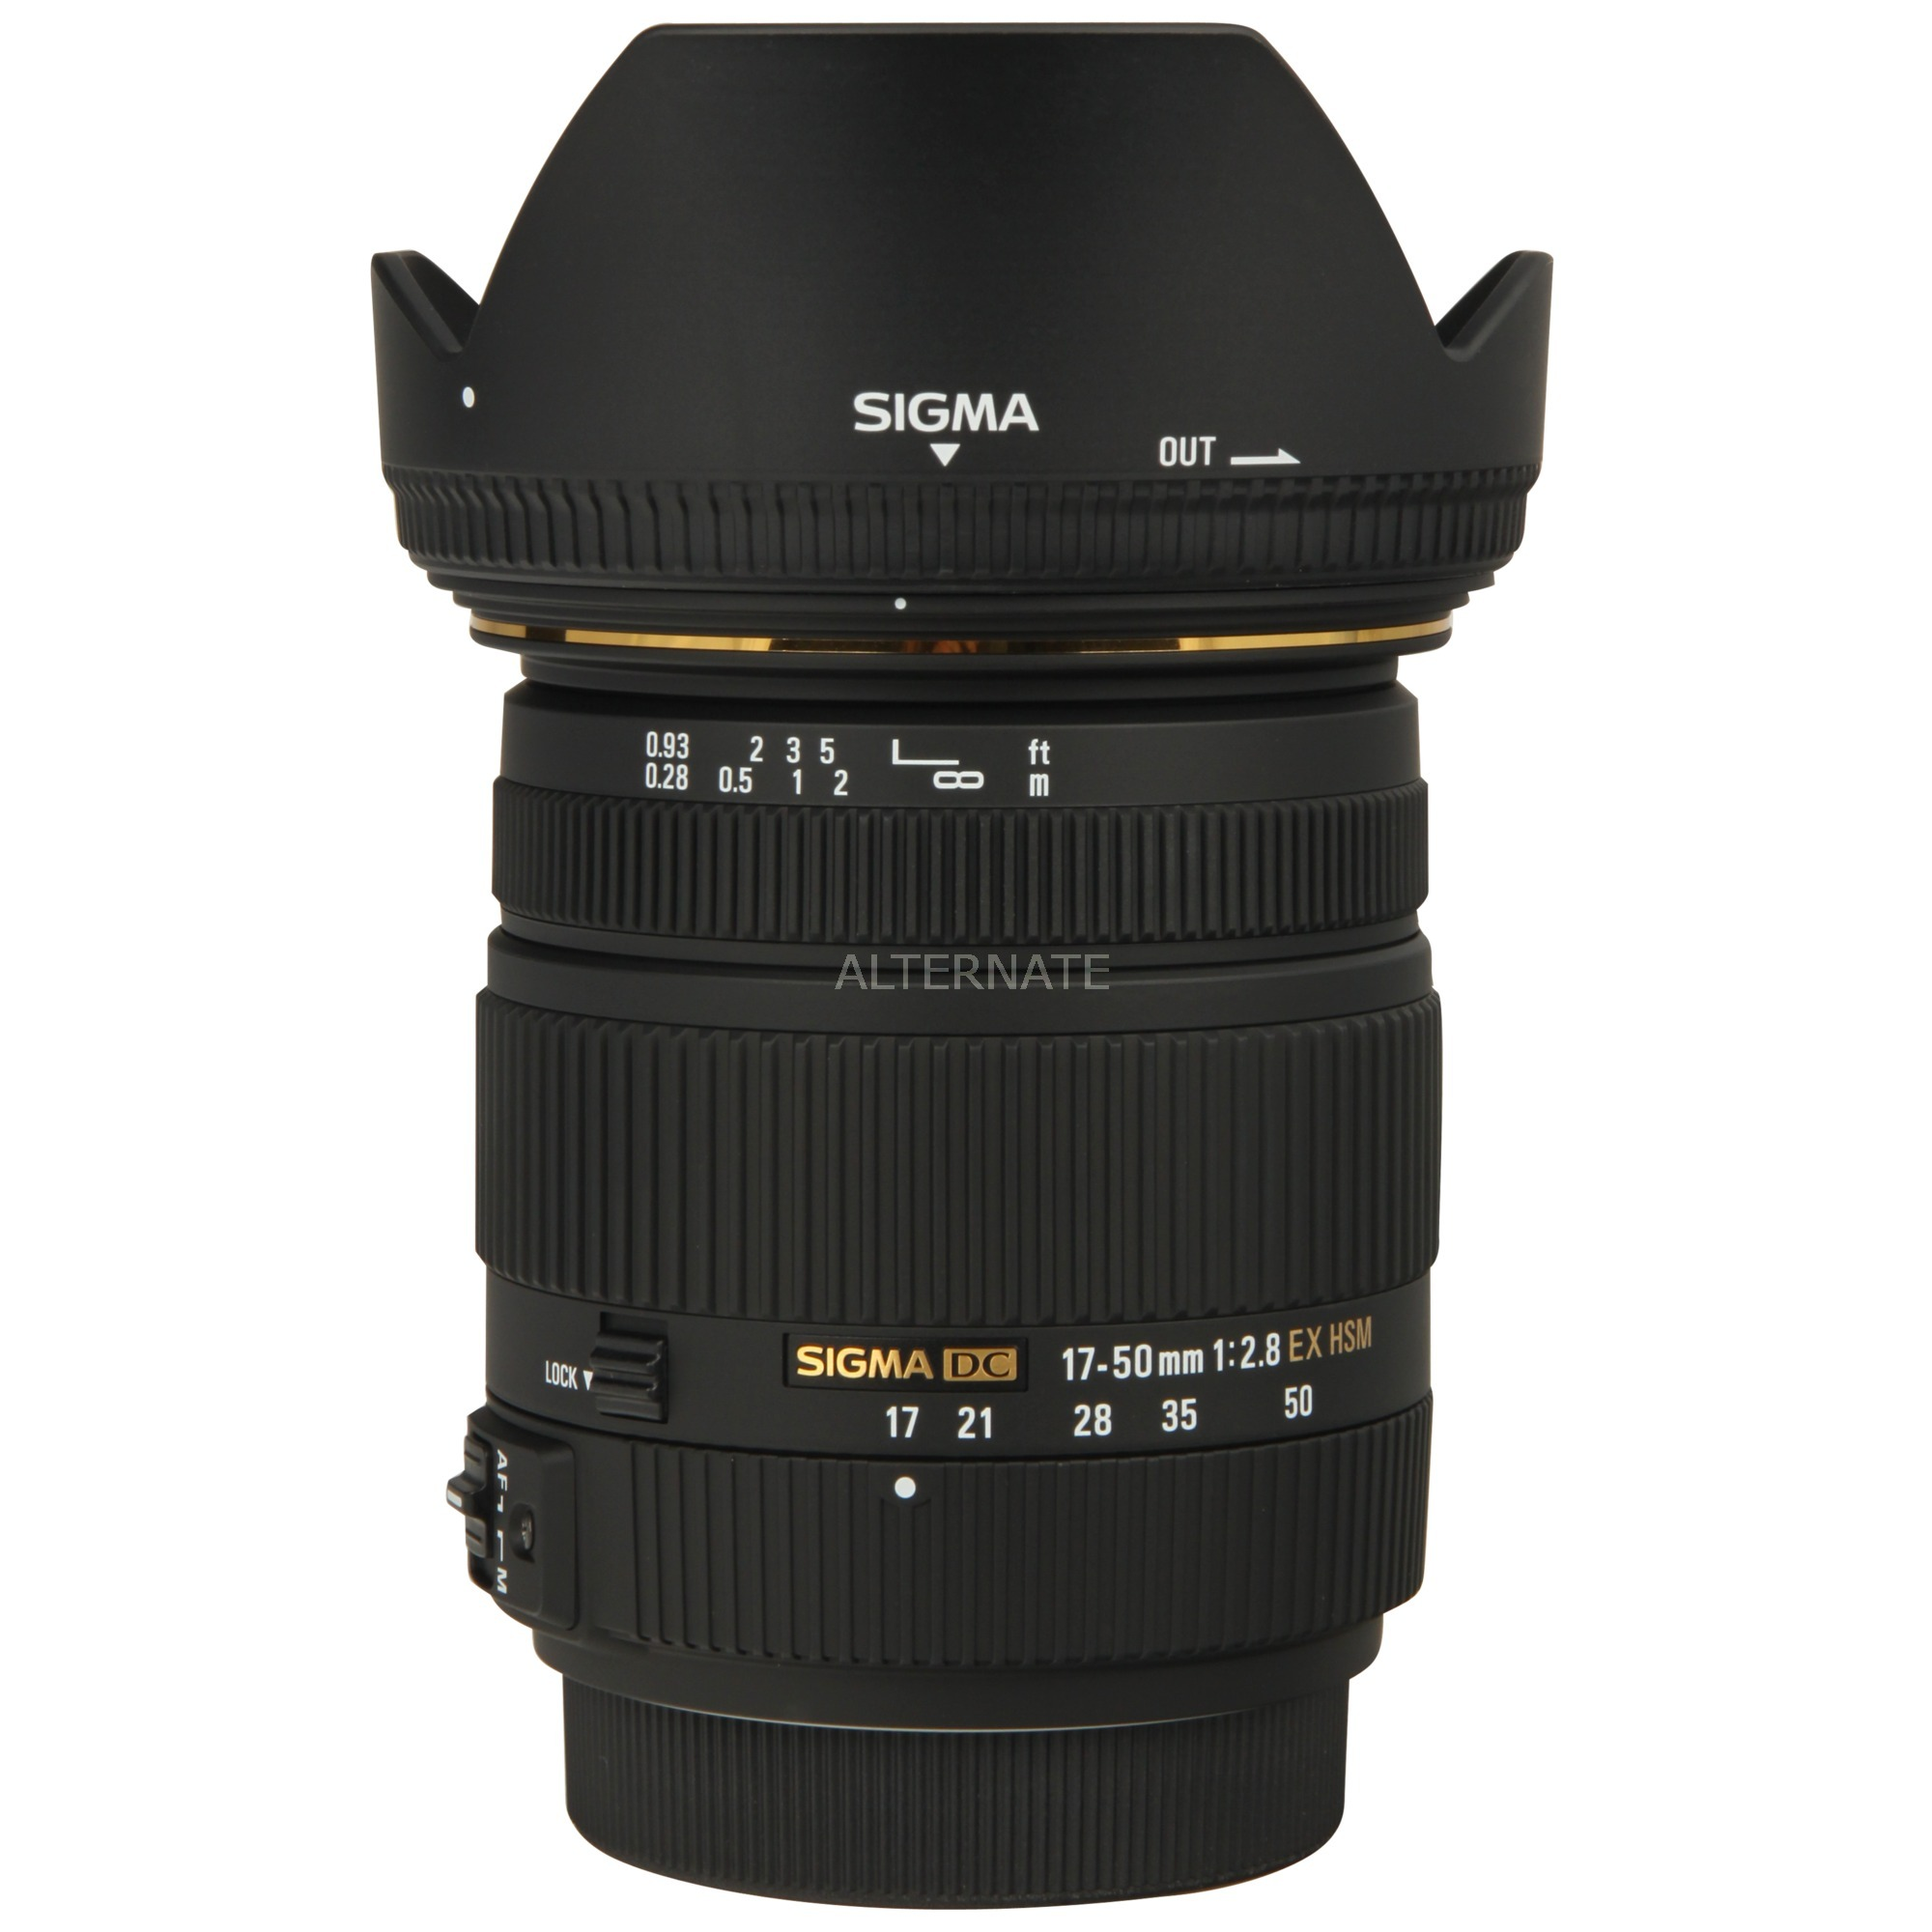 17-50mm F2.8 EX DC OS HSM Negro, Objetivos